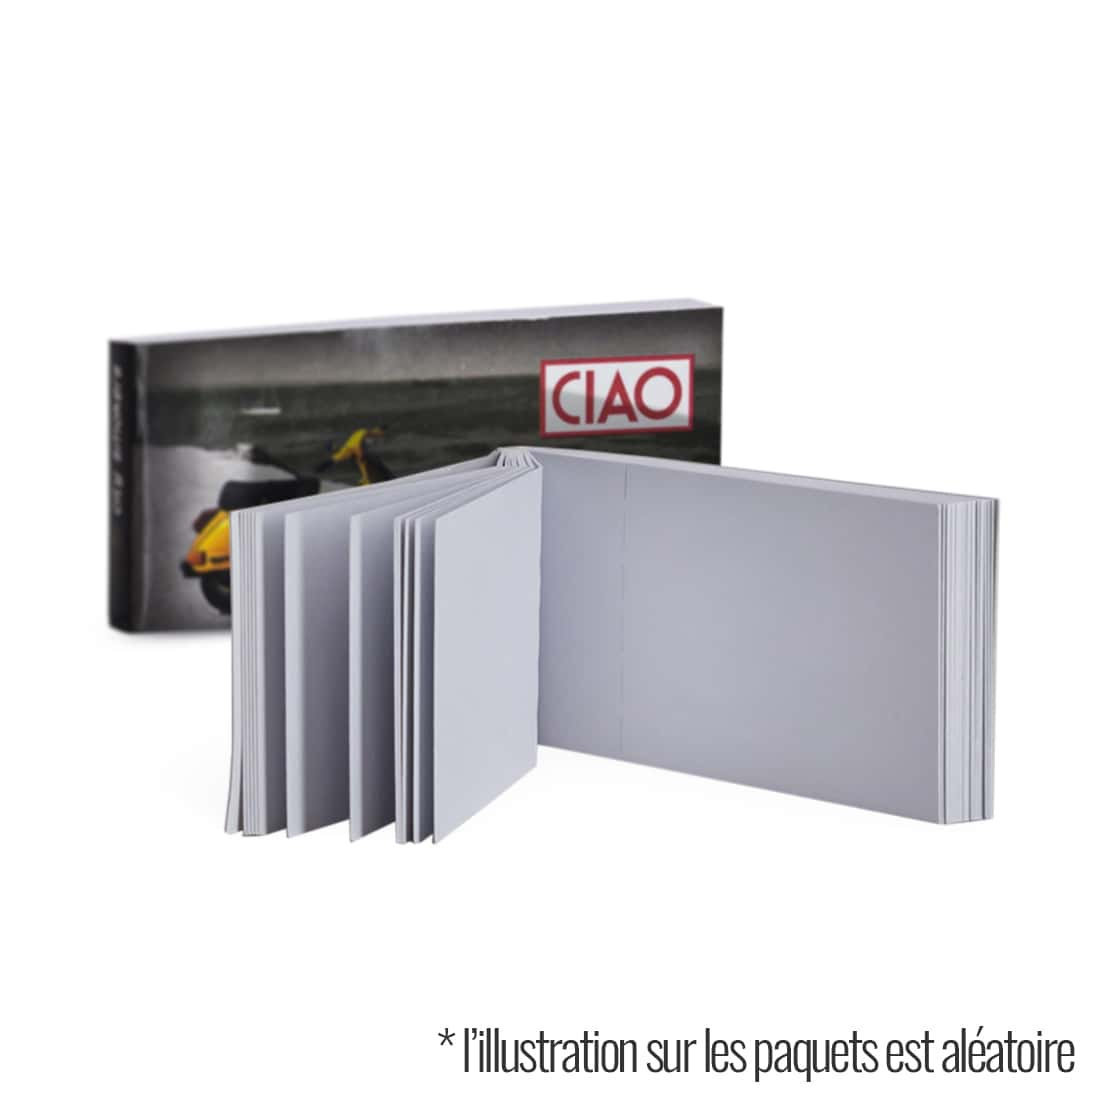 Photo #1 de Filtre carton Ciao x 1 large